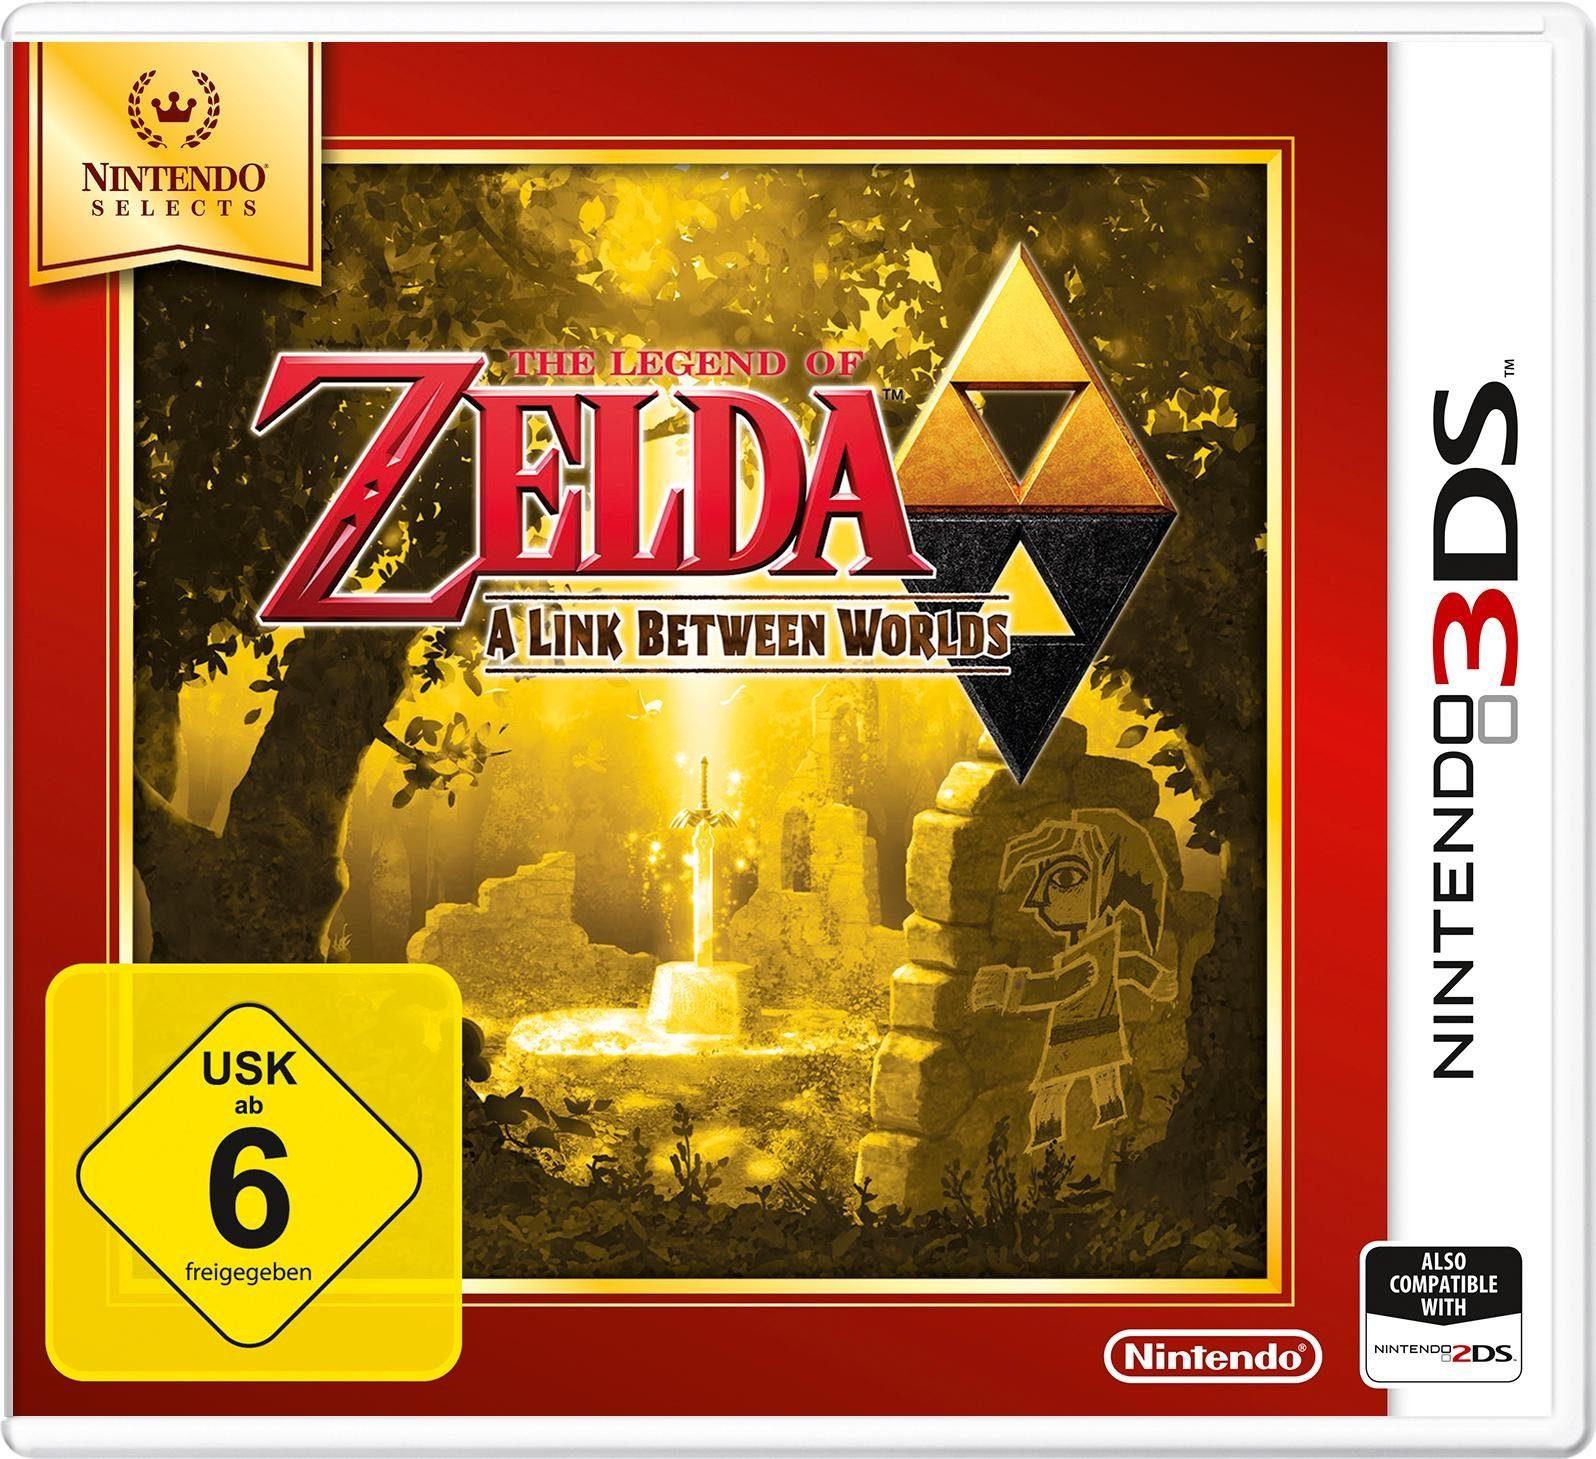 The Legend of Zelda: A link between Worlds Nintendo Selects 3DS